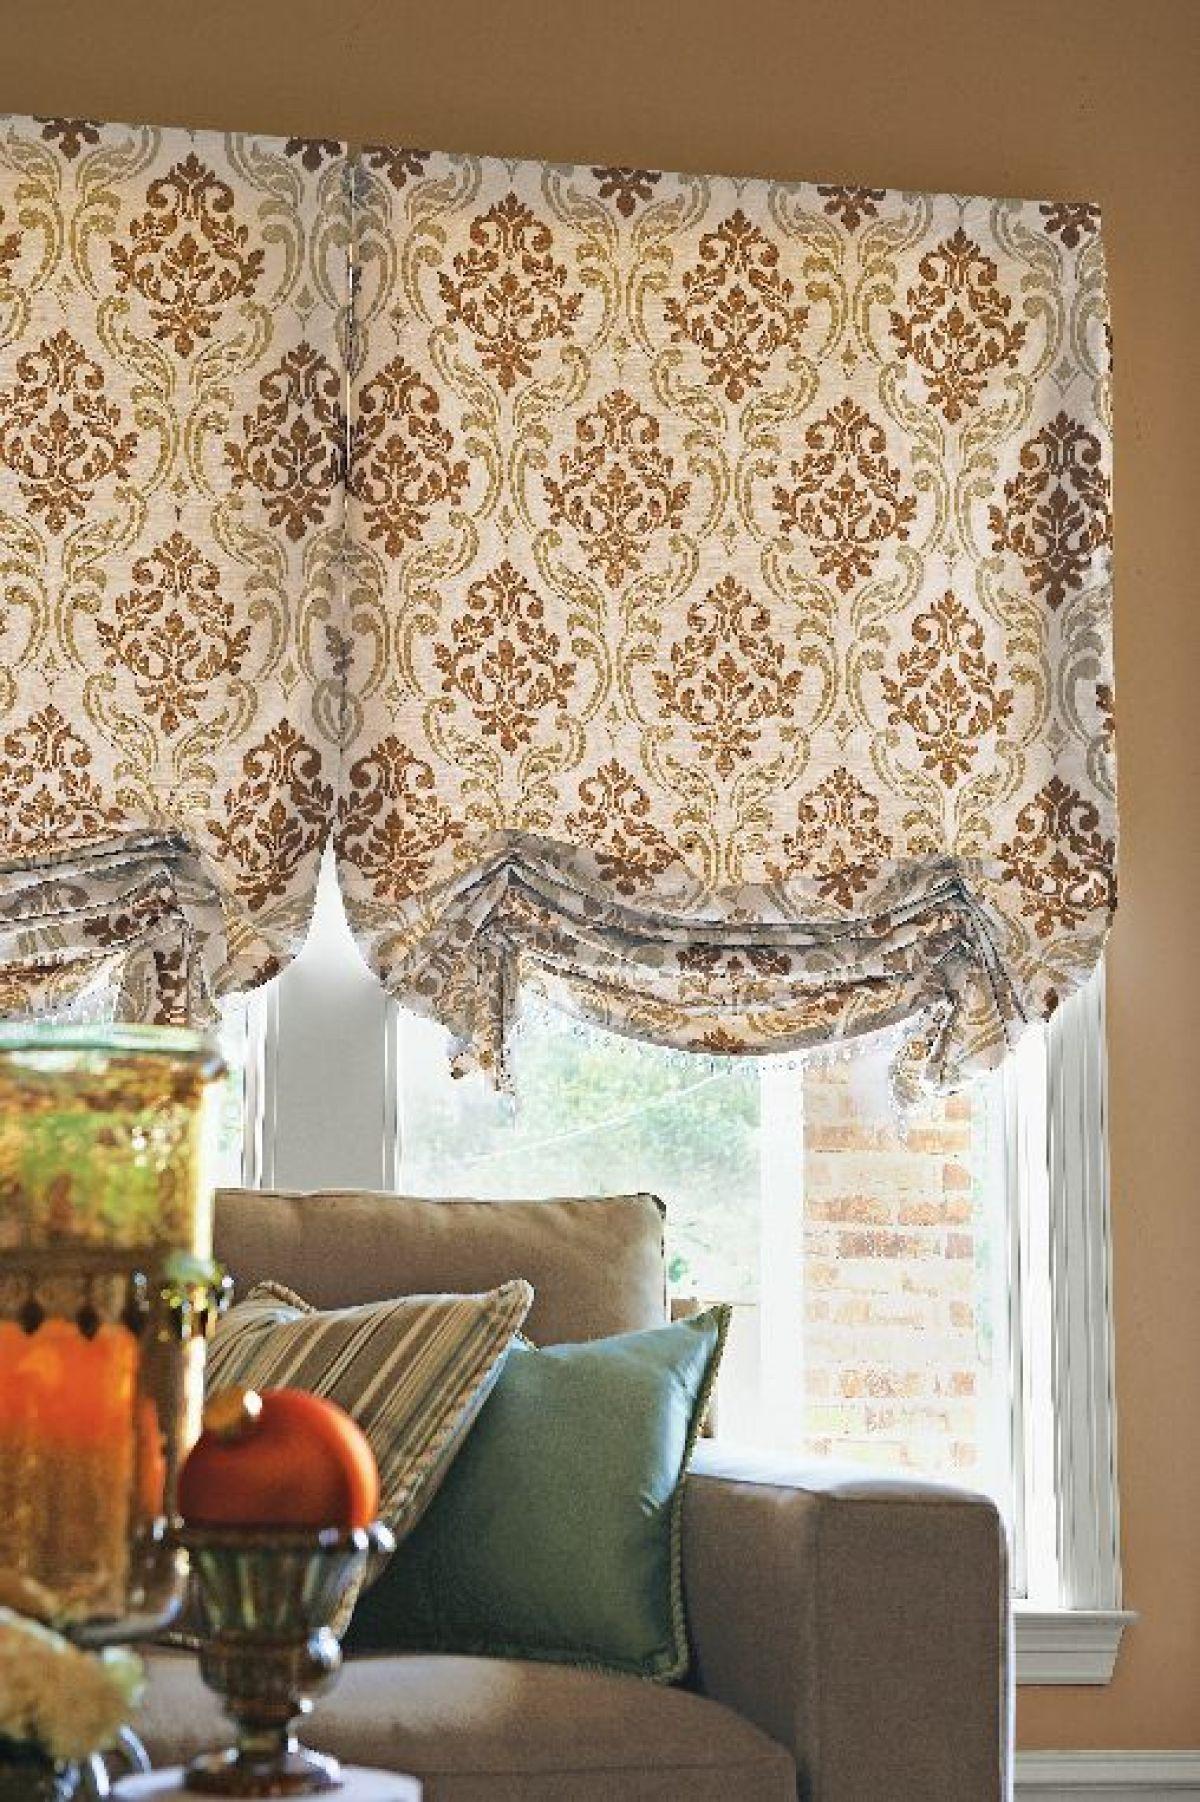 Kitchen nook window treatments  fabric shade  cortinas  pinterest  fabrics window and roman